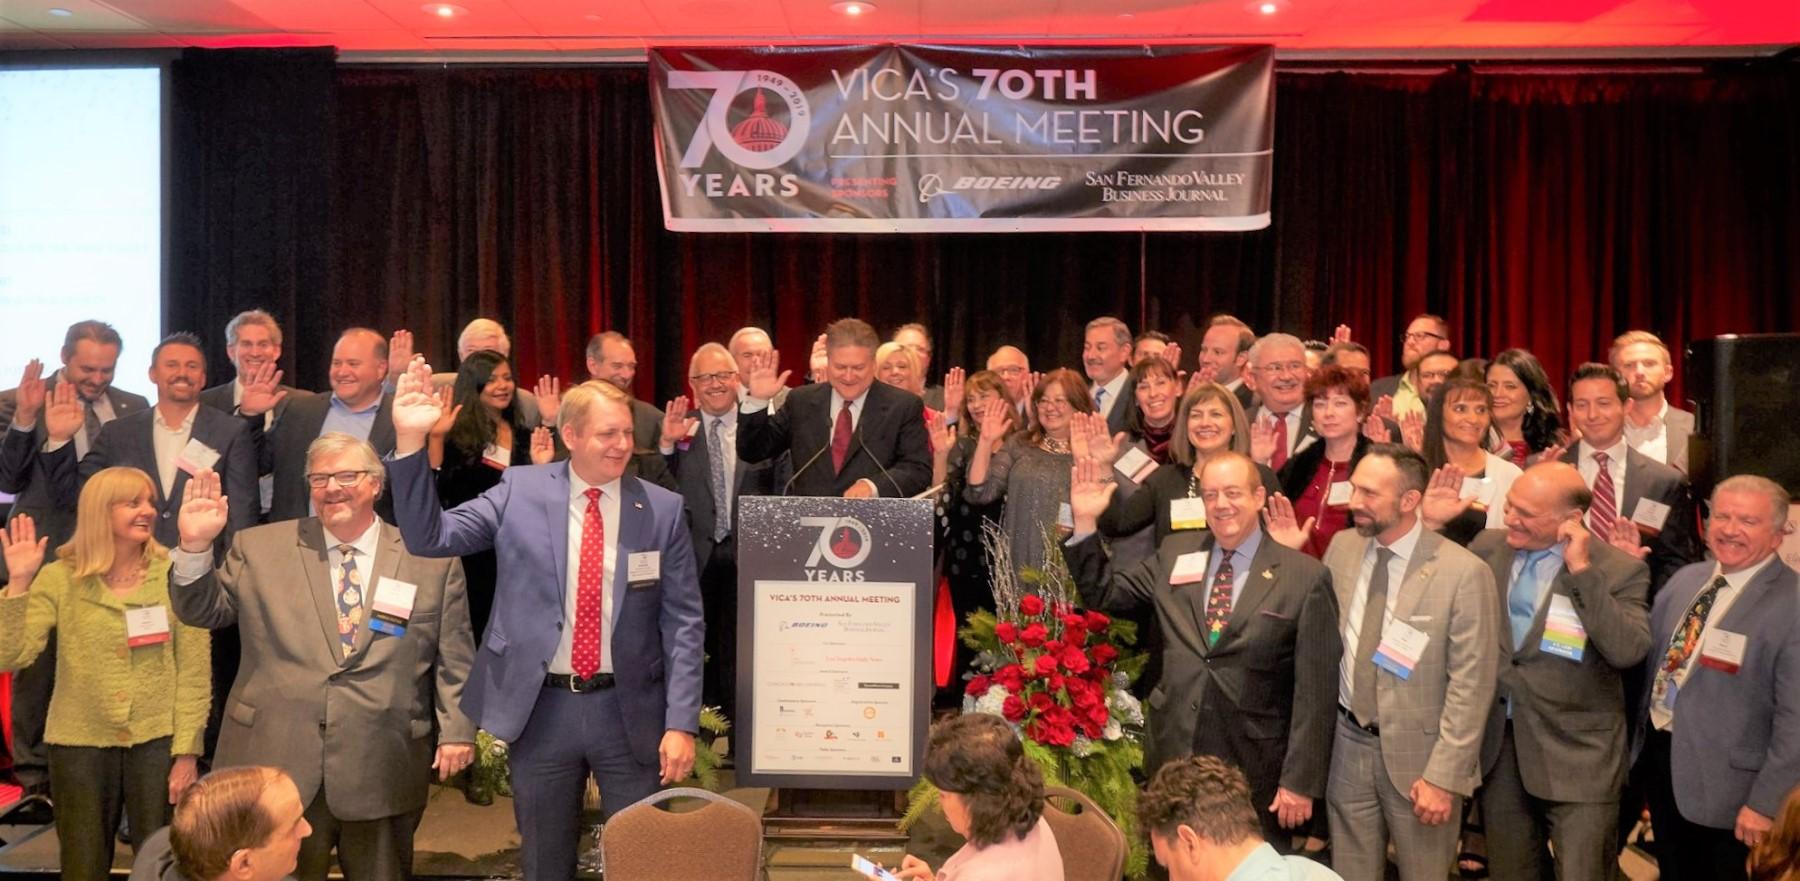 Senator Bob Hertzberg swearing in VICA's 2020 Board of Directors